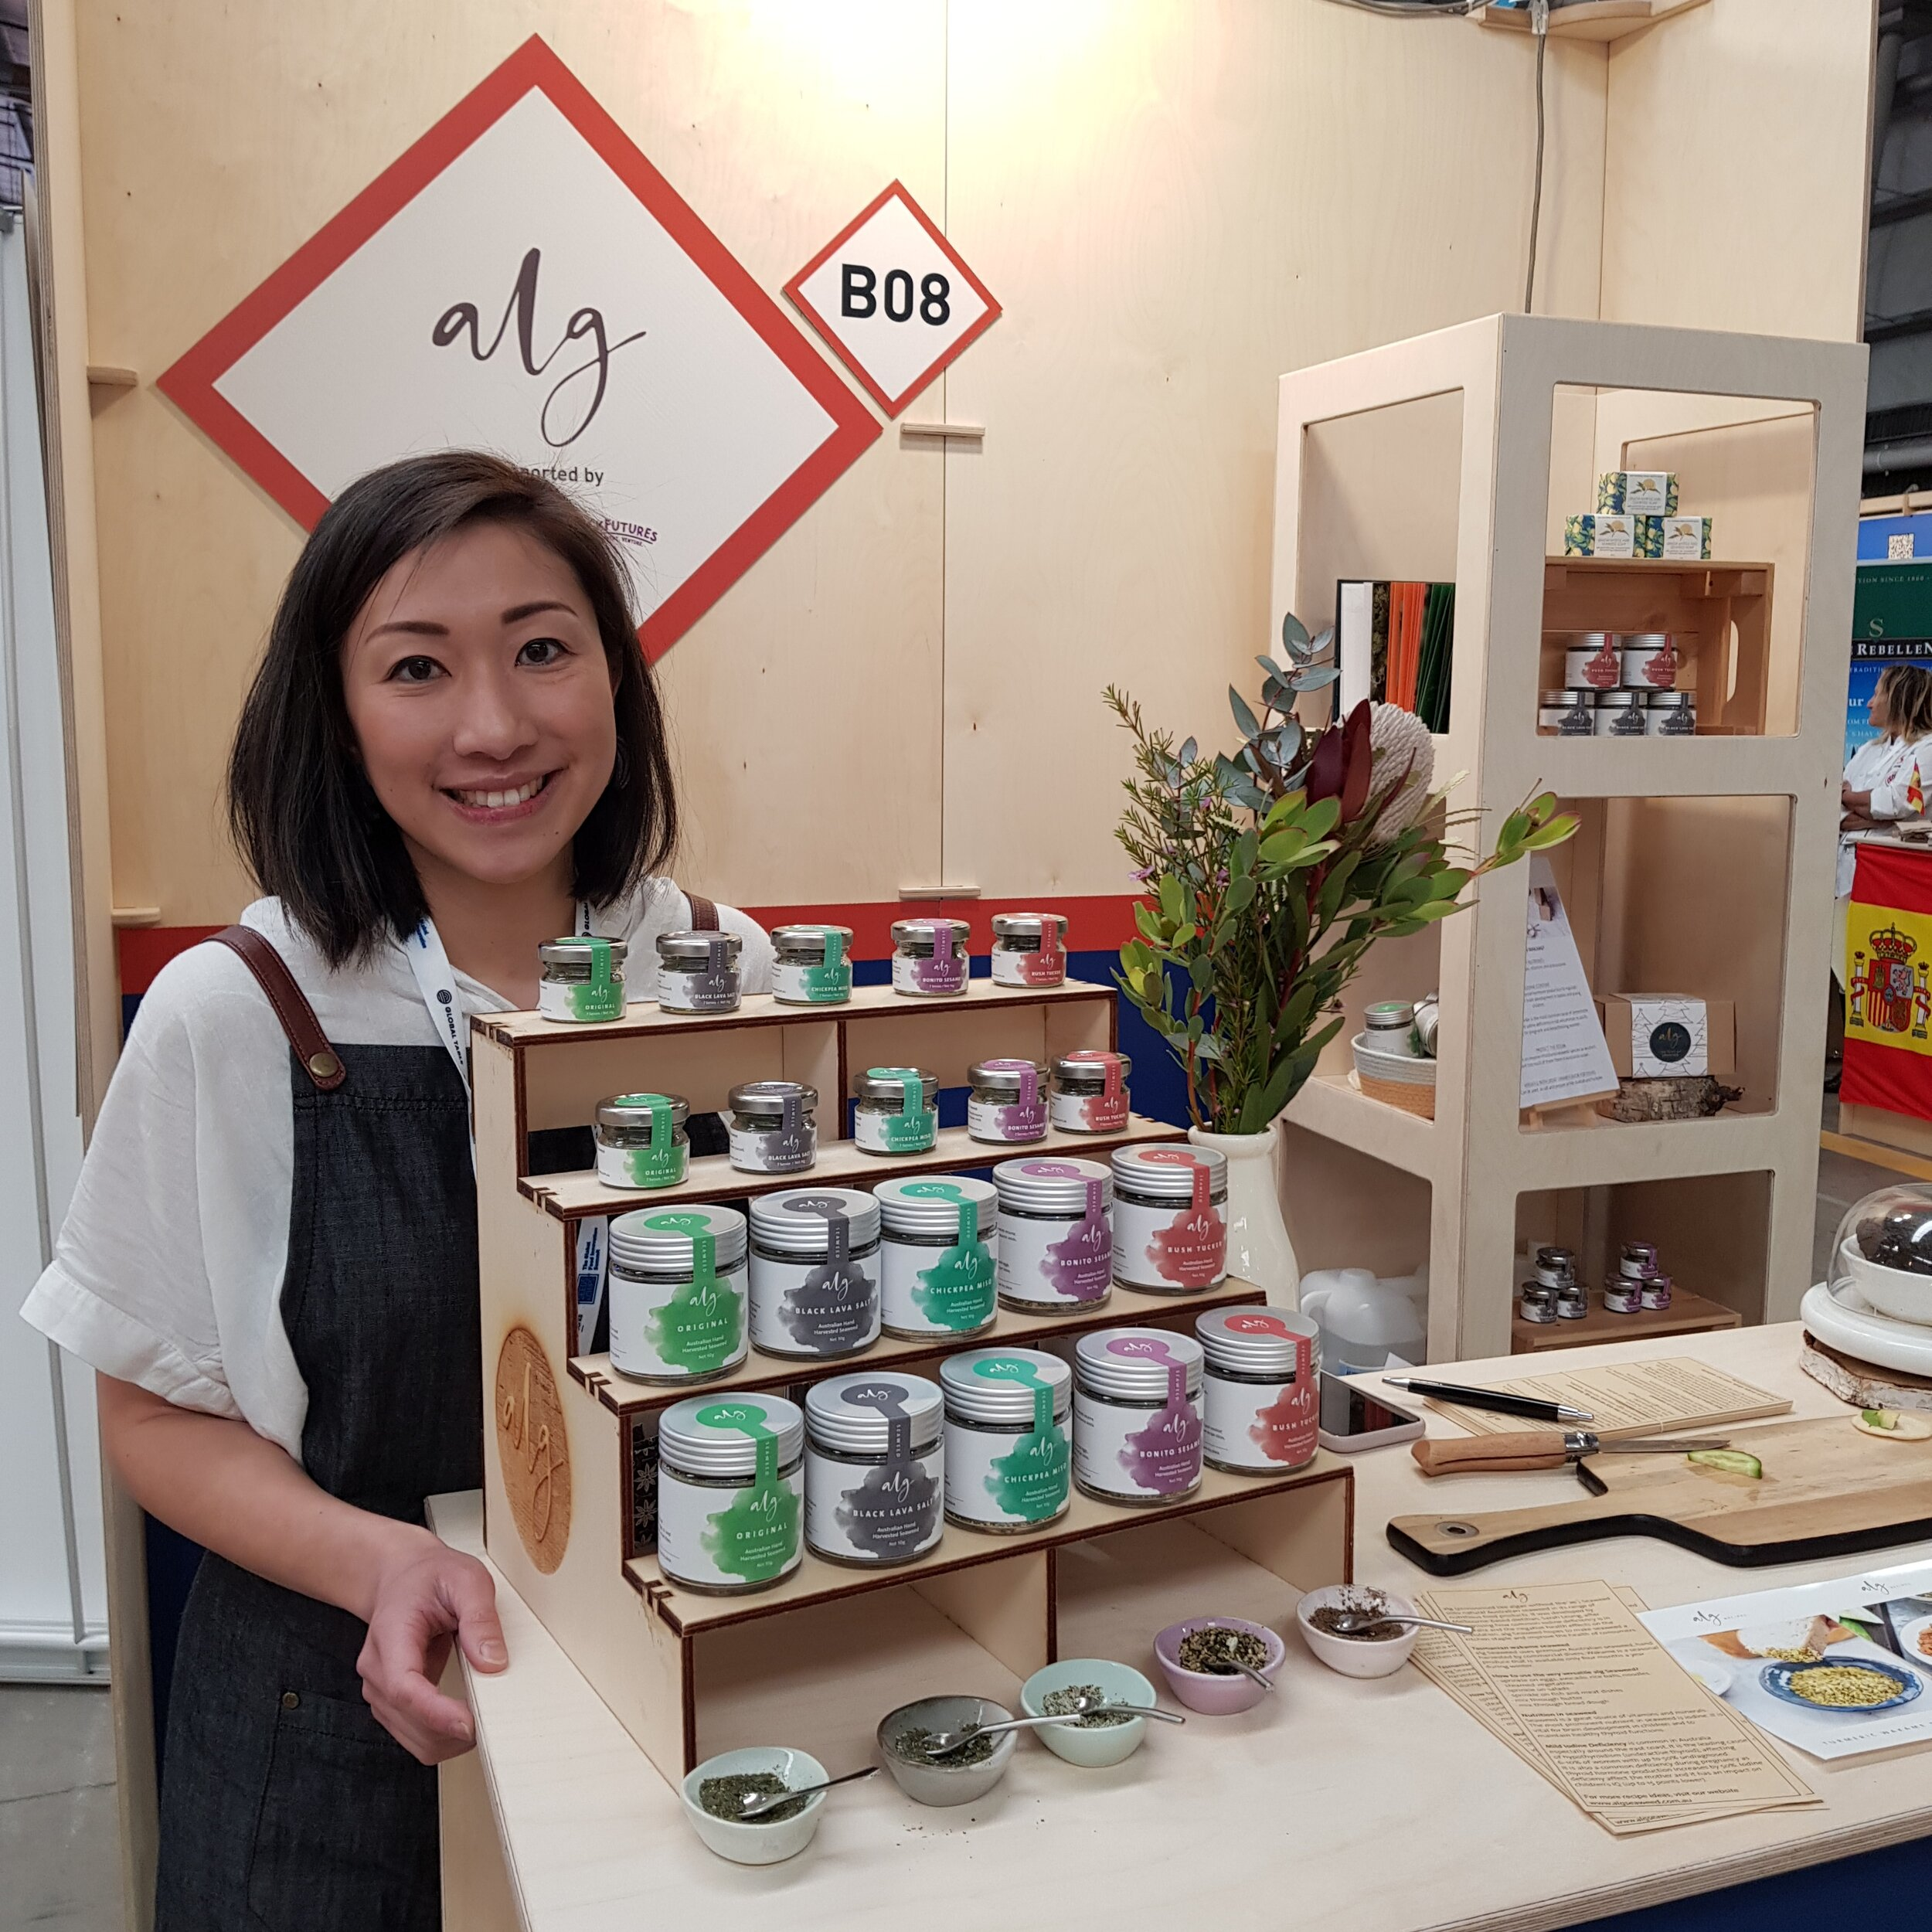 Sarah Leung, Founder of alg Seaweed at Global Table Australia, September 2019